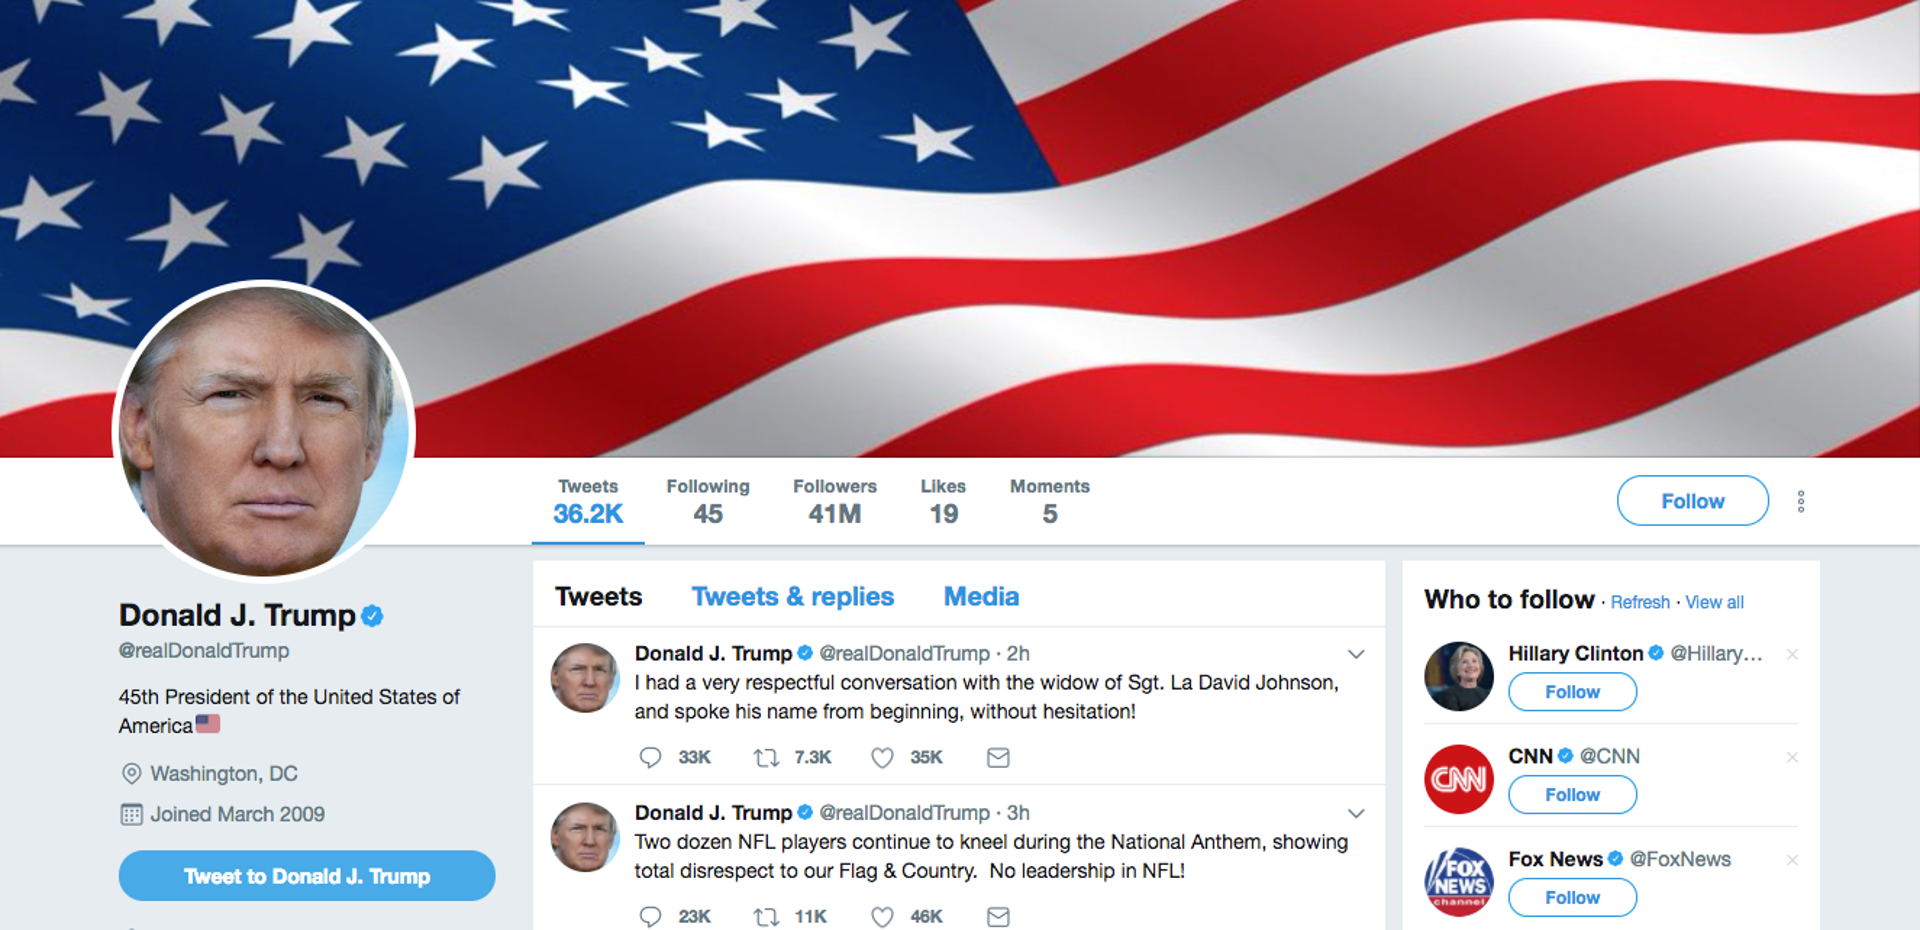 Examining The Presidentu0027s Twitter Activity. Screenshot, CC BY ND